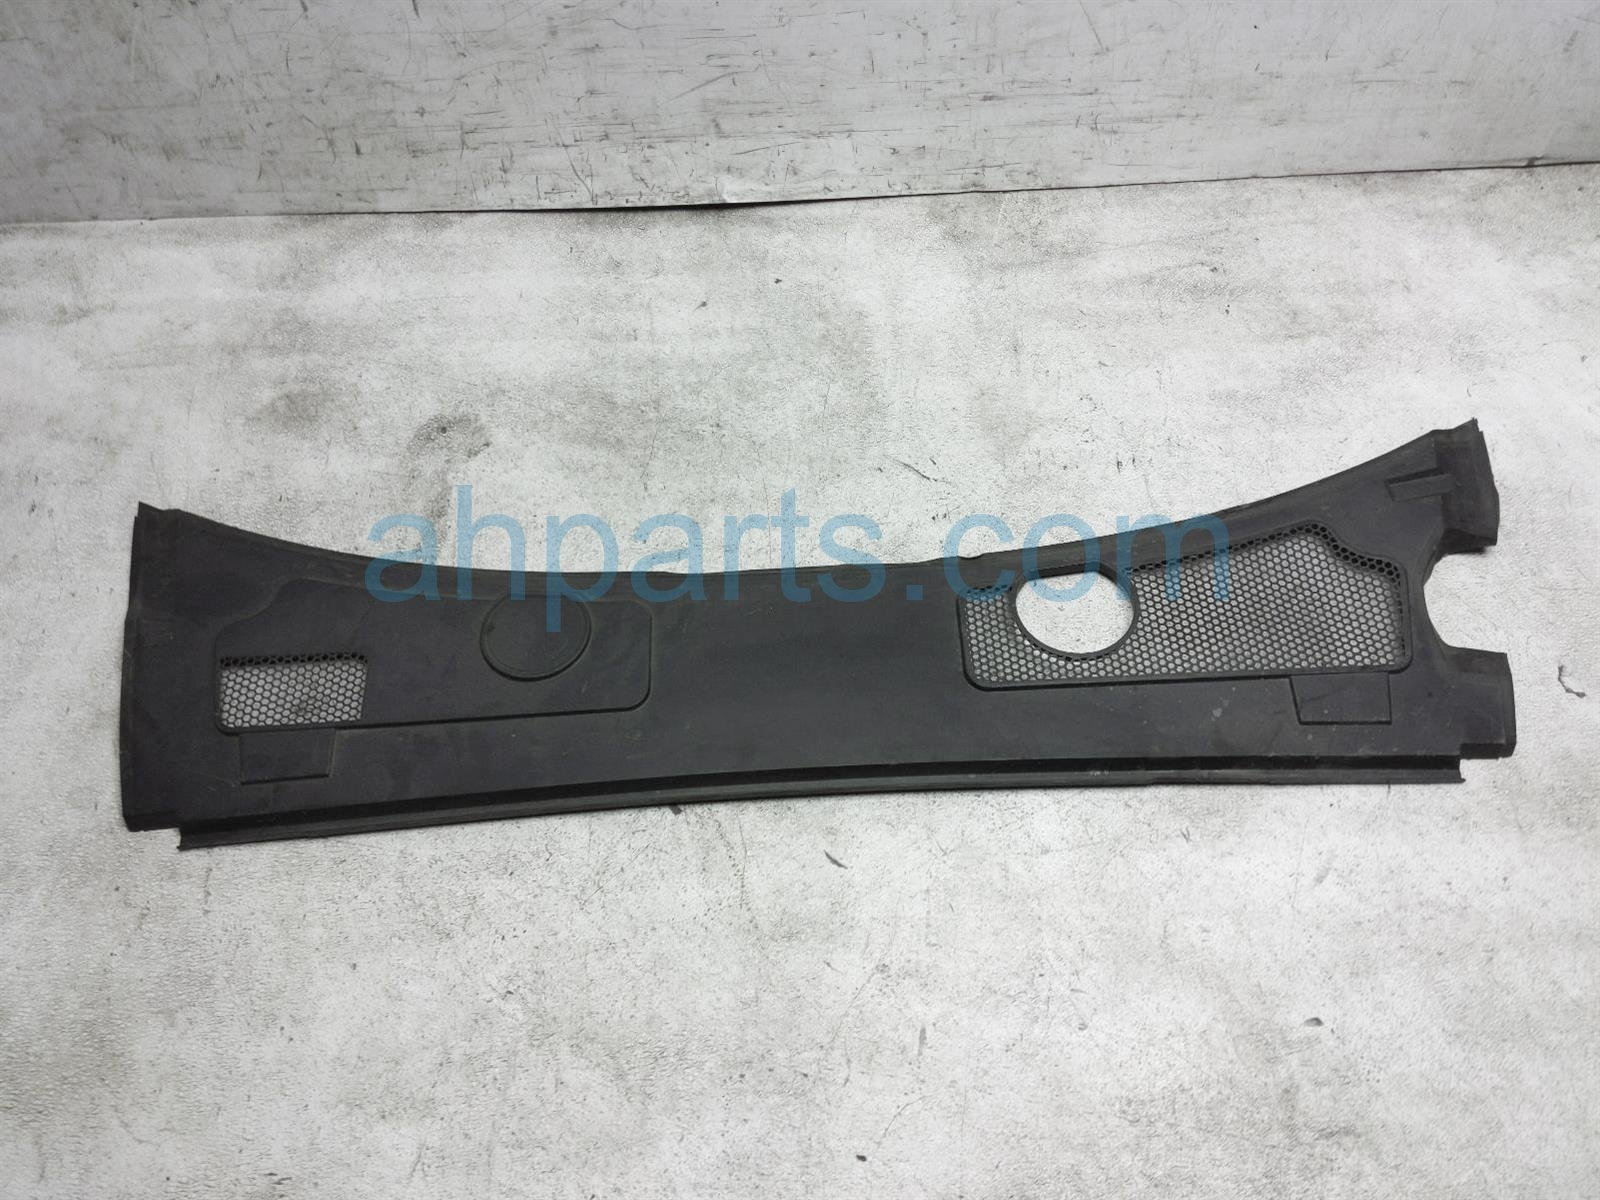 2011 Audi A6 Audi Windshield Cover Cowl 4F1 819 447 A 01C Replacement